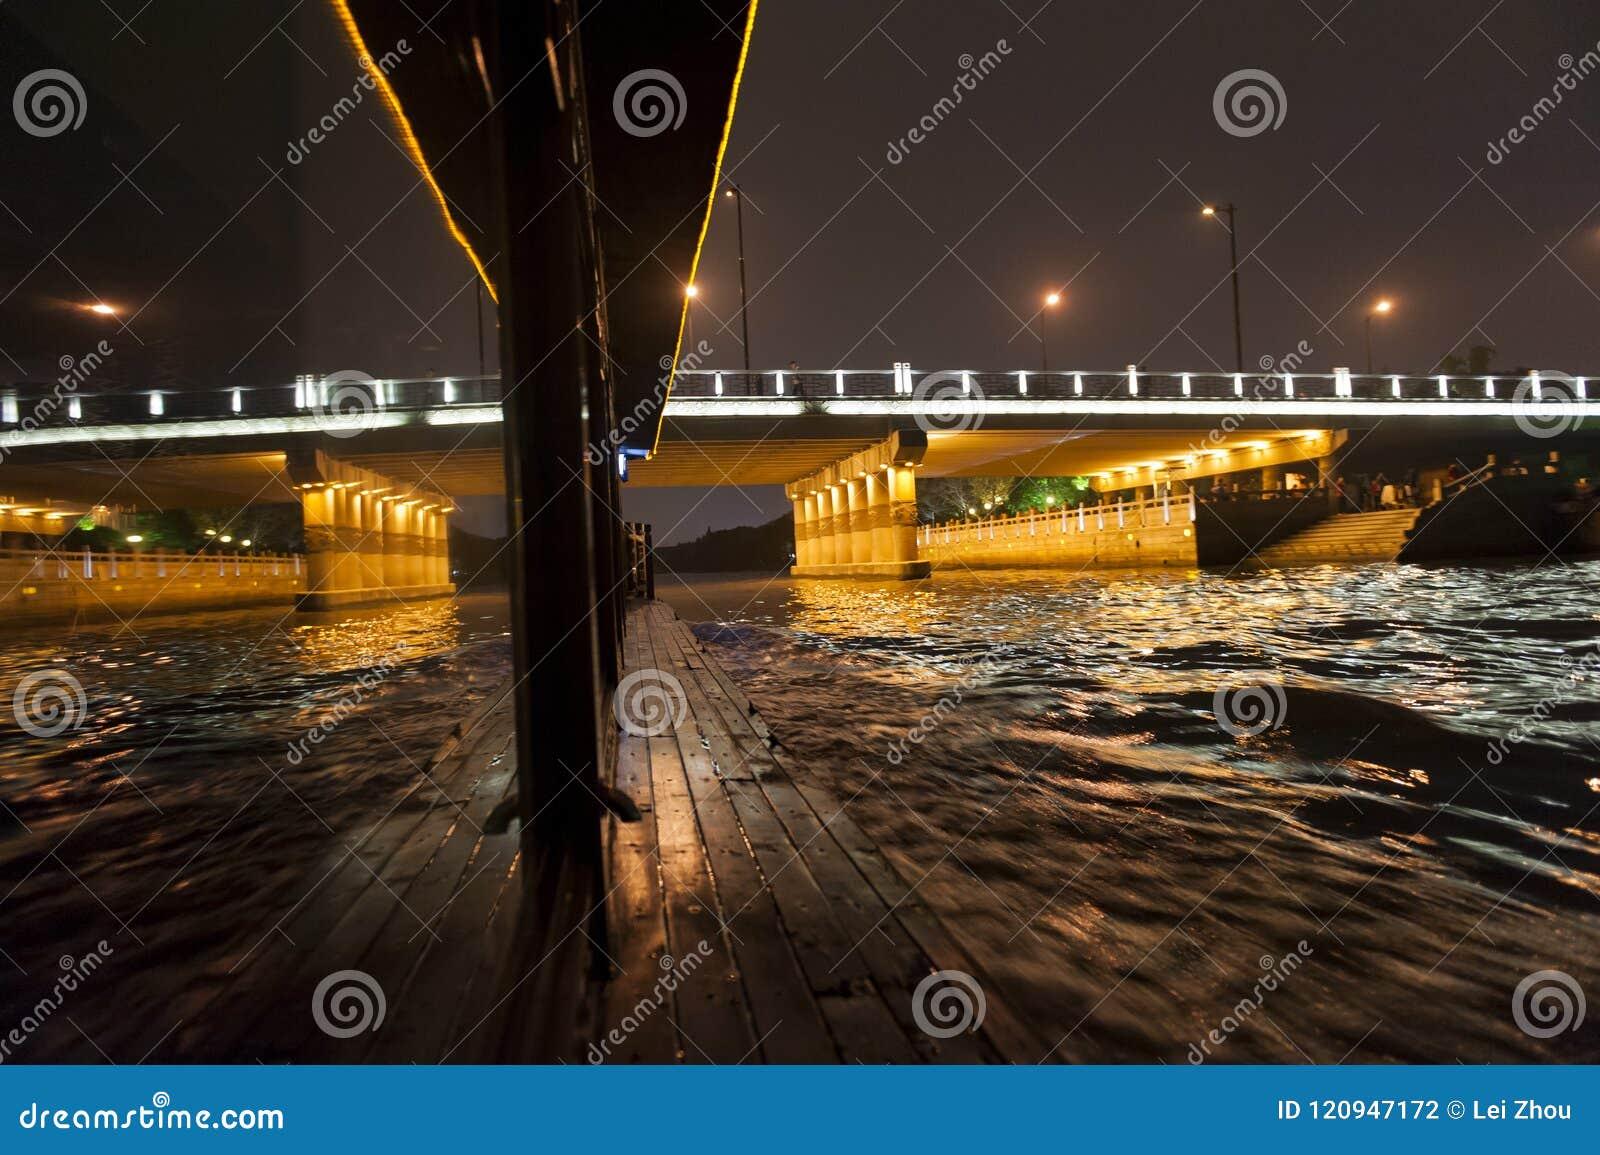 Reflection on the Suzhou River,Suzhou,China